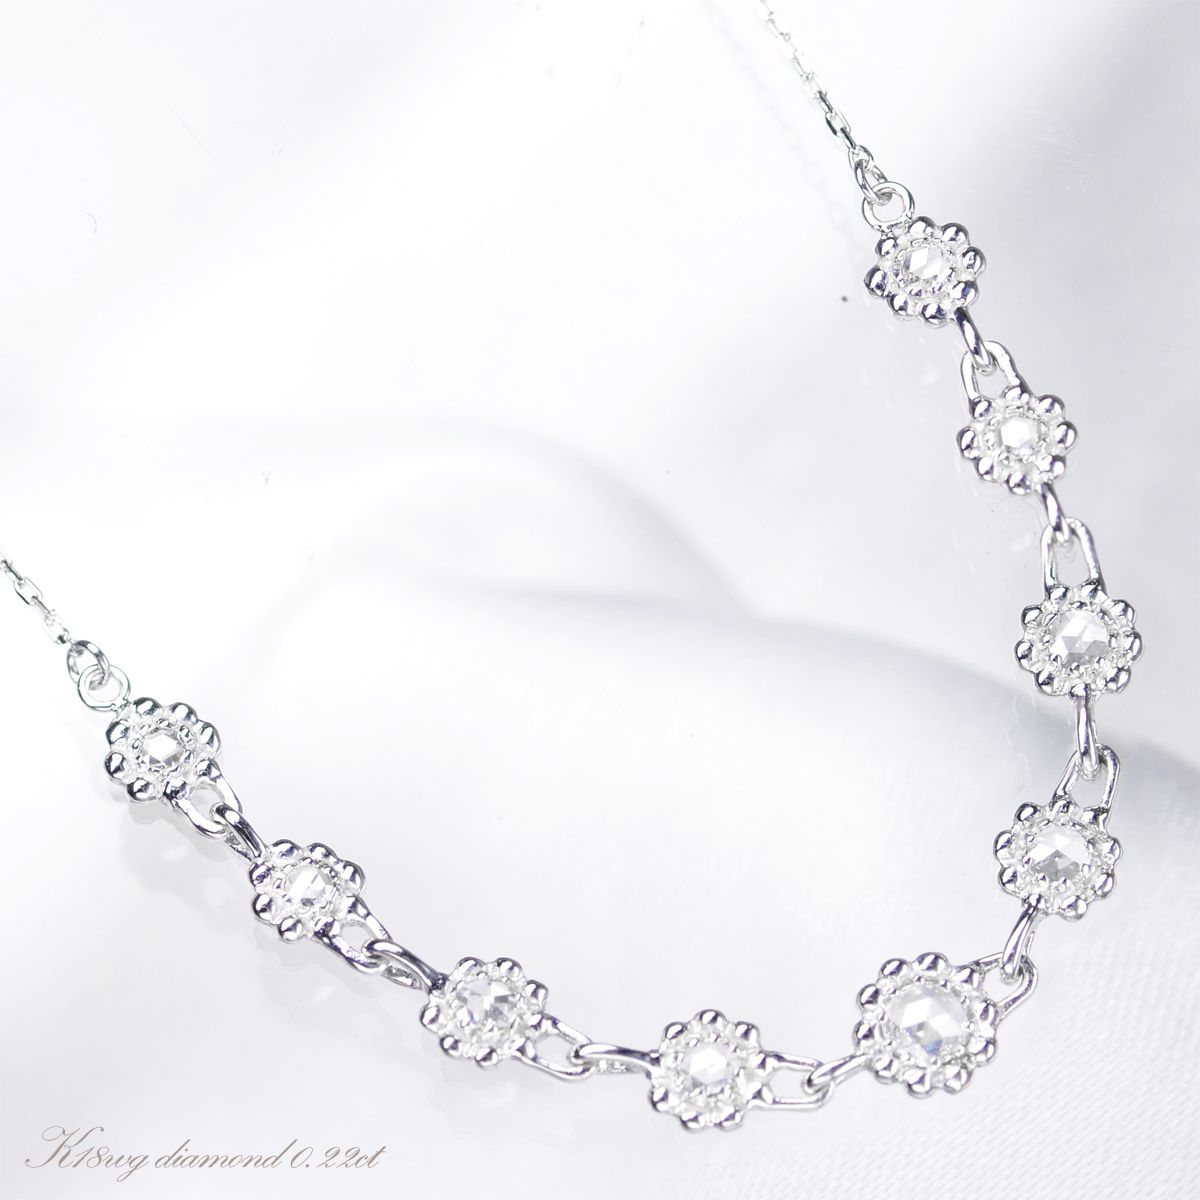 K18WG ローズカット ダイヤモンド 9石 ネックレス/送料無料